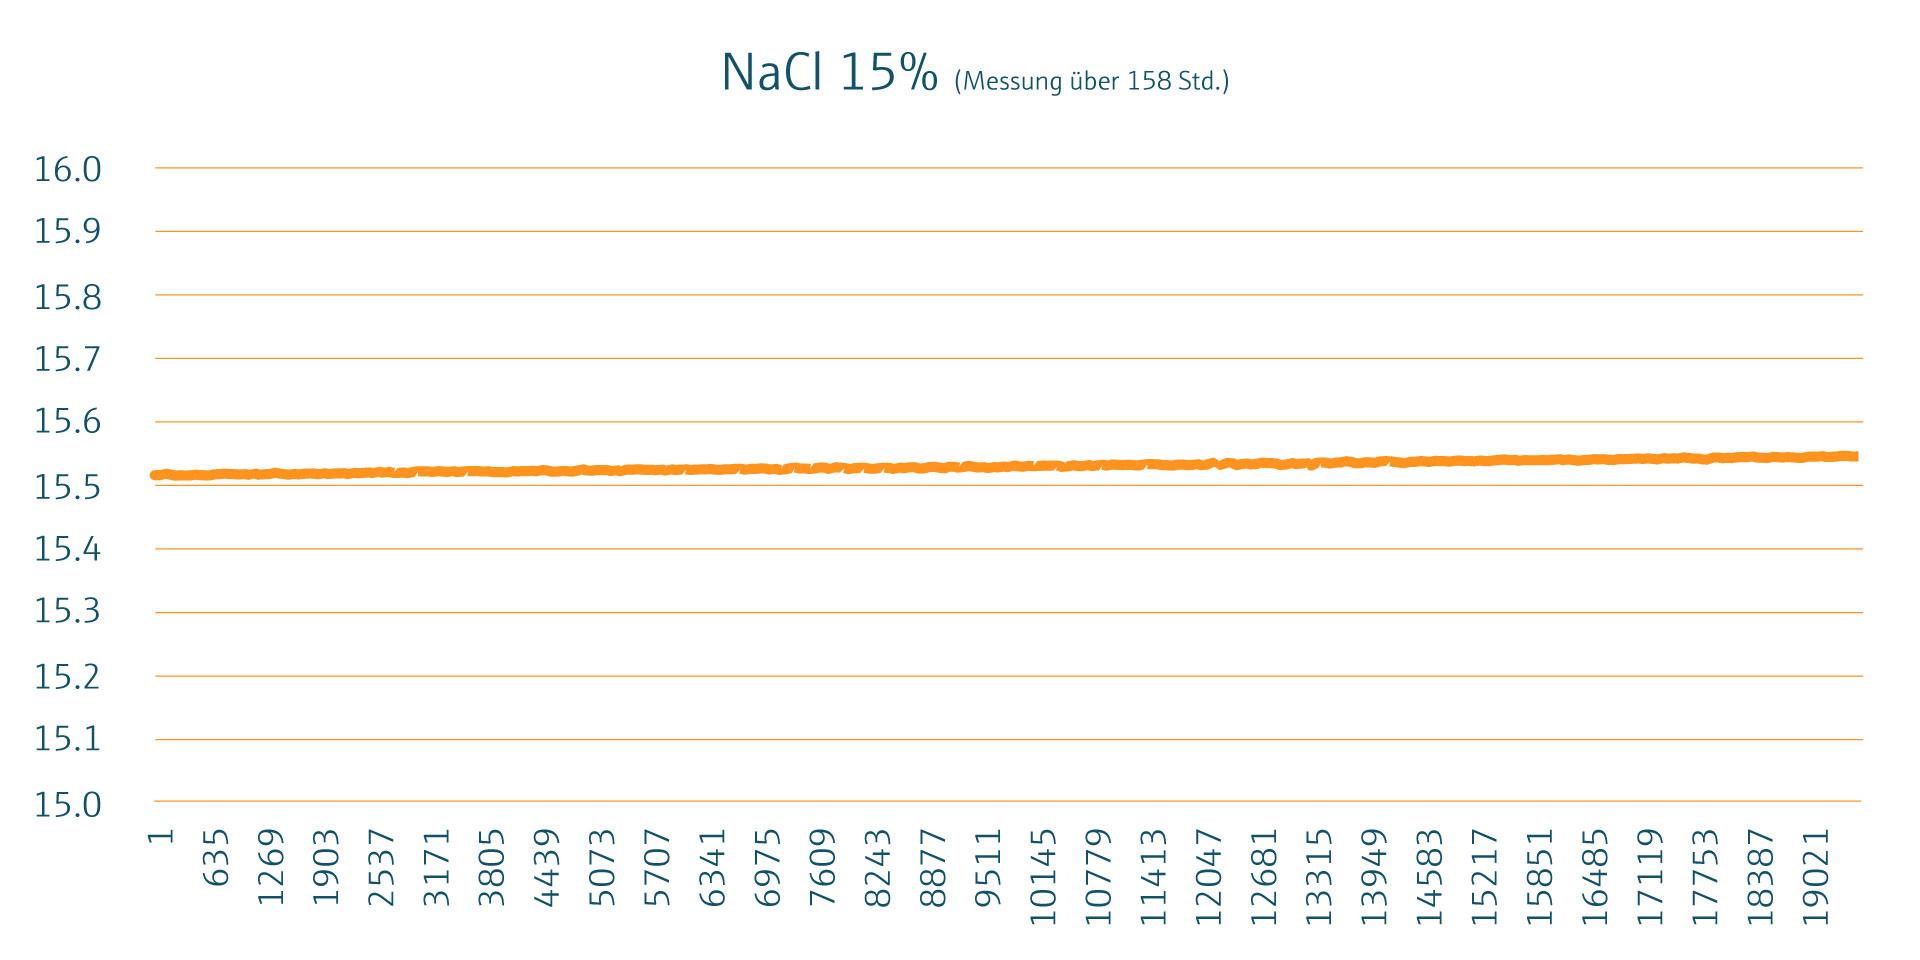 Grafik_Sole_NaCi-15-Langzeit_Wissenszwinker